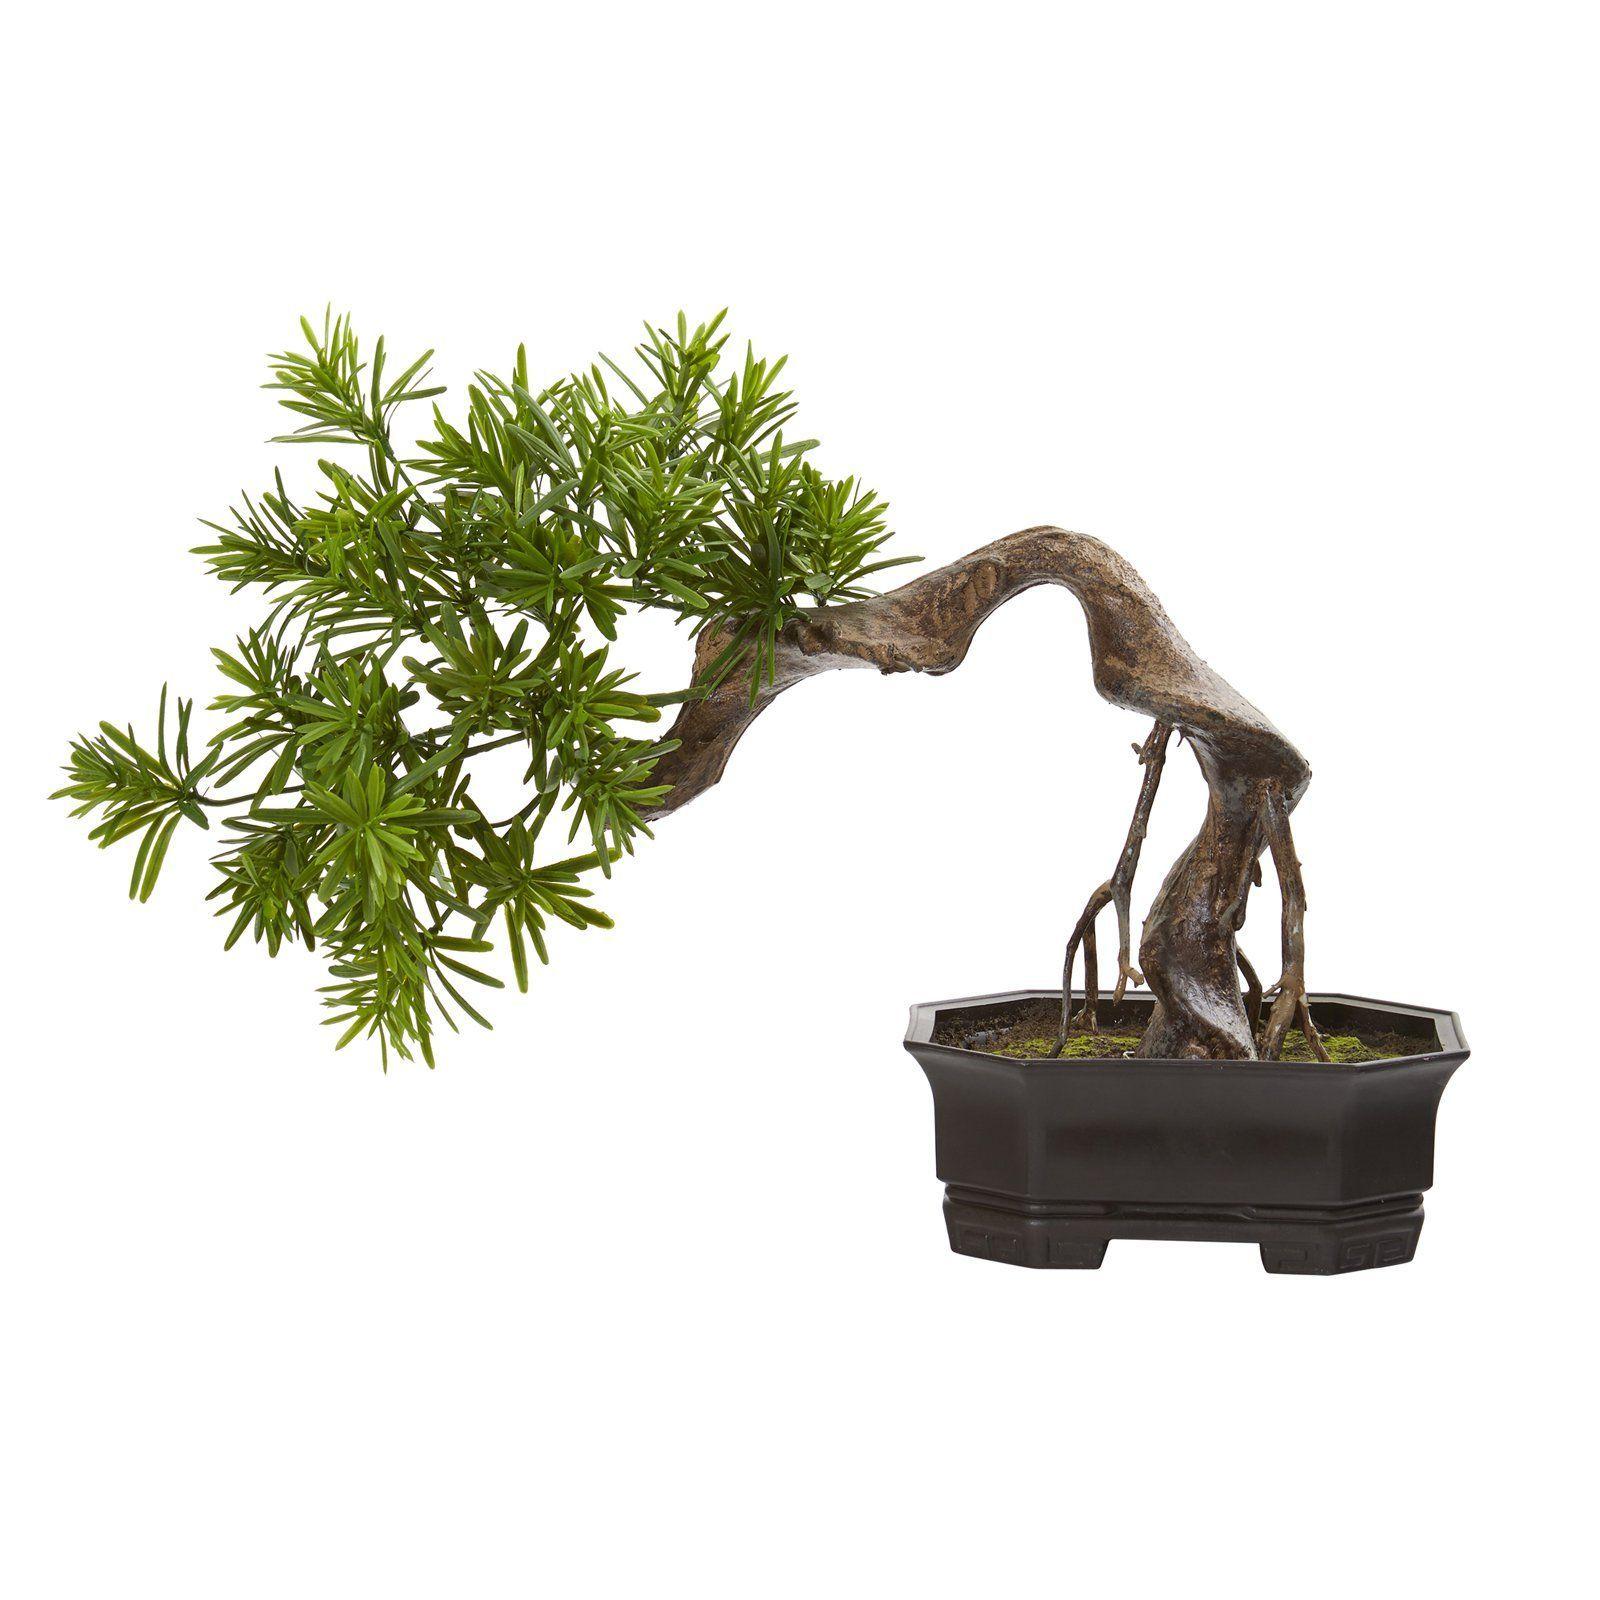 Artificial Bonsai Cerca Viva Podocarpos Natural Nearly Plant Podocarpus Styled Nearly Natural 20 In Bonsai Styles Podocarpus Bonsai Artificial Plants